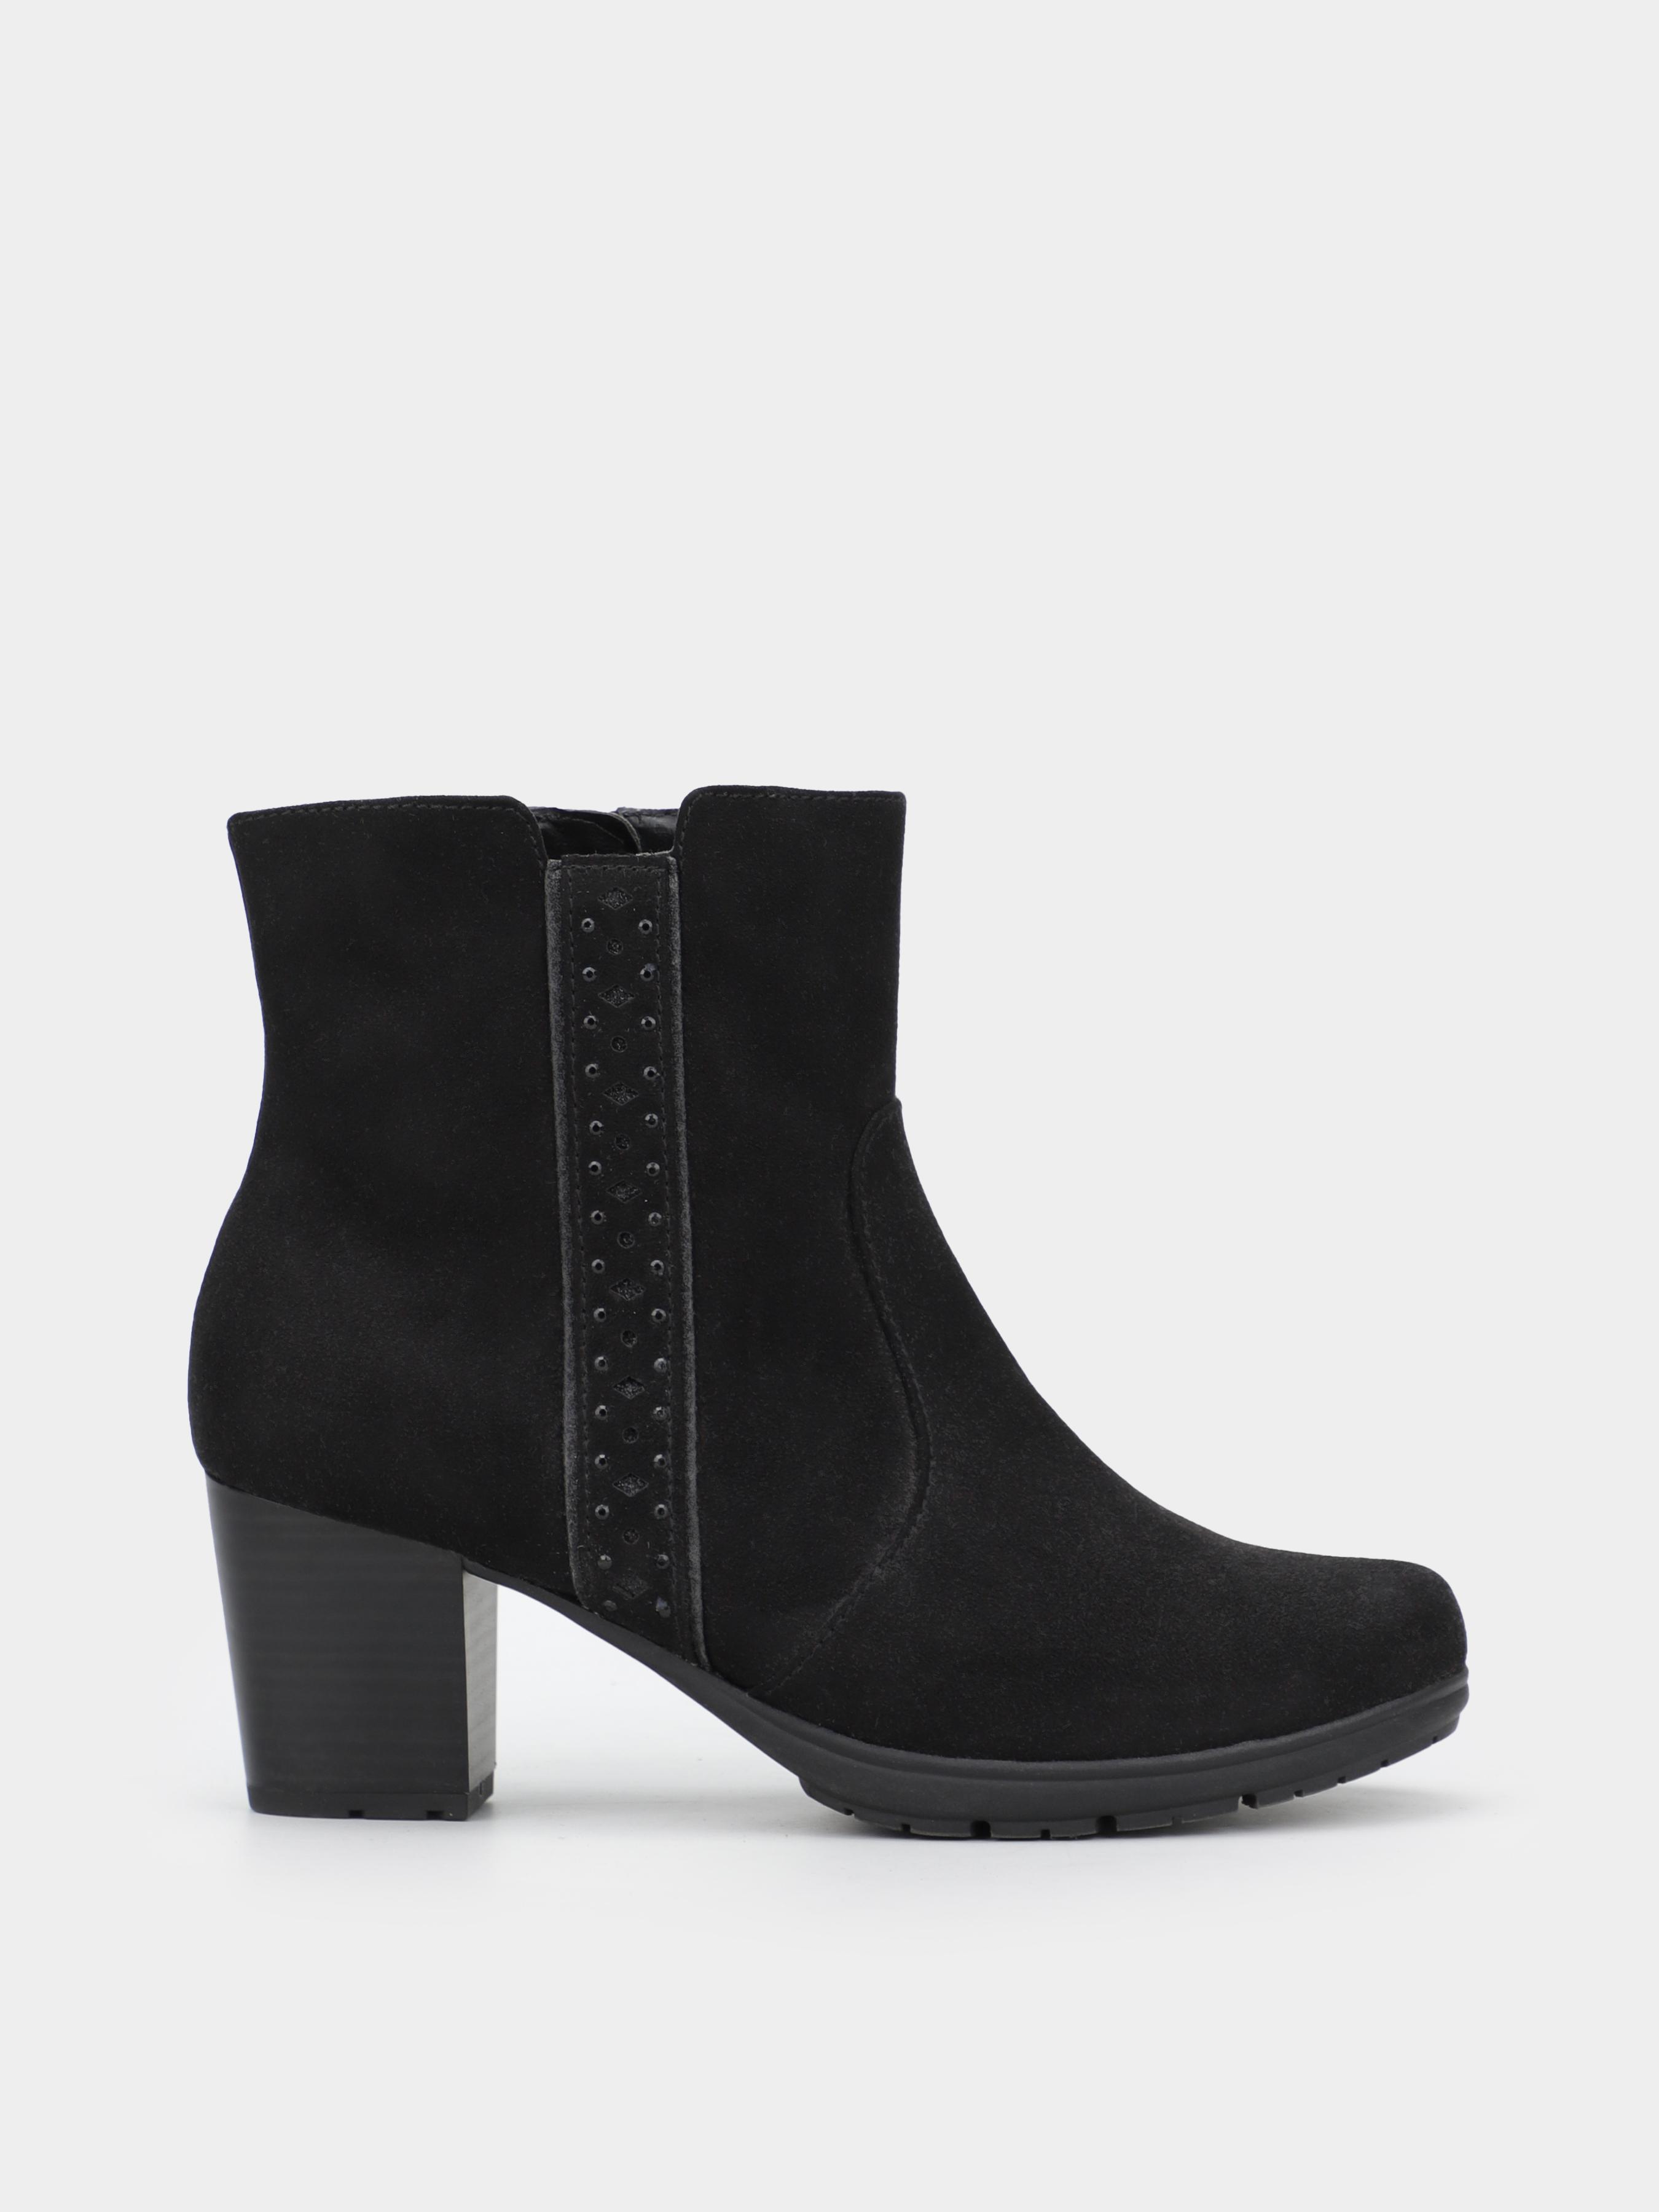 Ботинки для женщин Jana 8Q24 купить онлайн, 2017